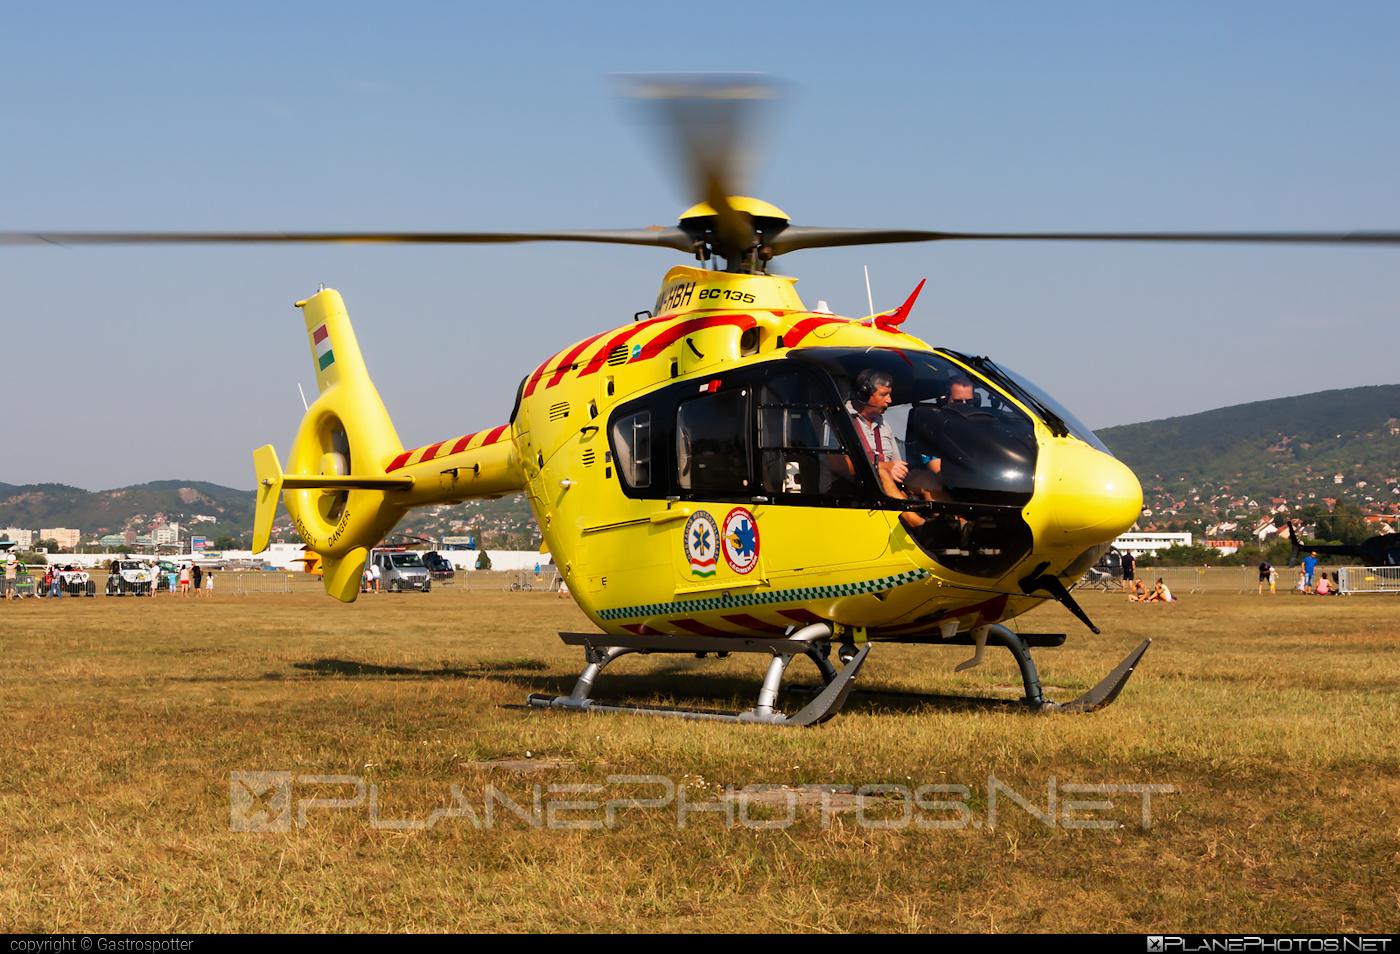 Eurocopter EC135 P2+ - HA-HBH operated by Magyar Légimentő Nonprofit (Hungarian Air Ambulance) #ec135 #ec135p2 #ec135p2plus #eurocopter #hungarianairambulance #magyarlegimentononprofit